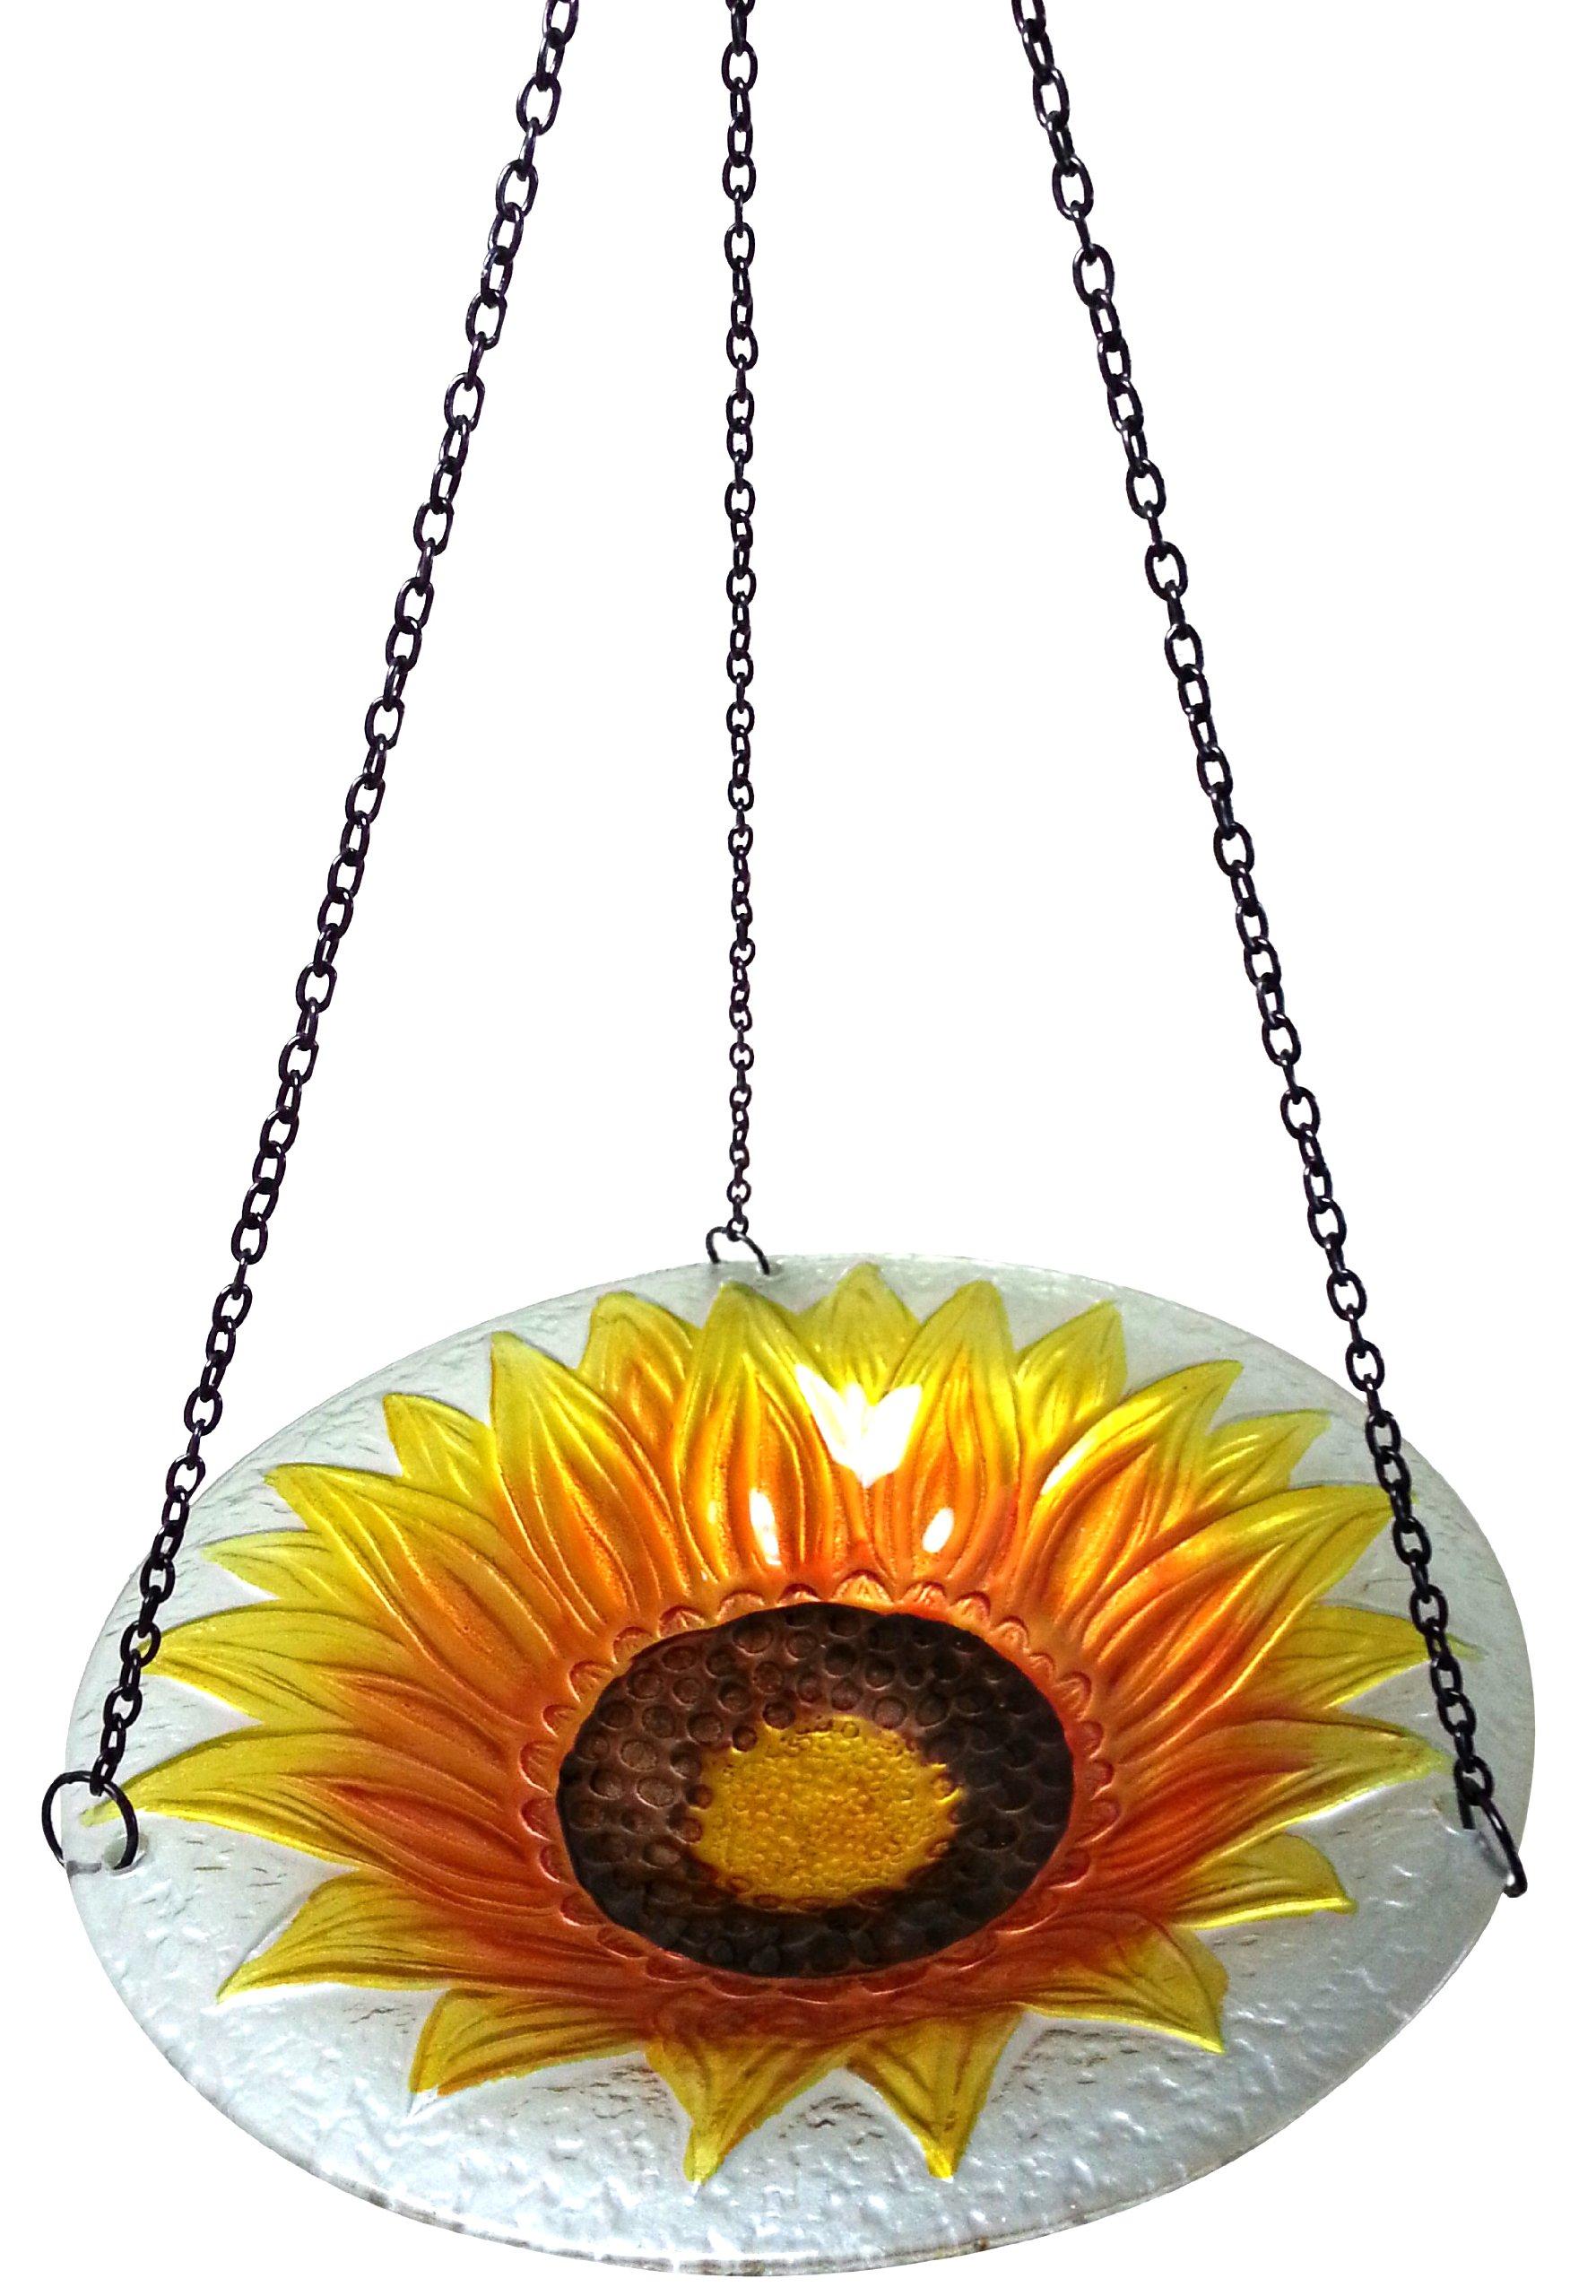 Continental Art Center CAC8ES15327 Hanging Sunflower Glass Bird Feeder with Iron Chain, 11-Inch